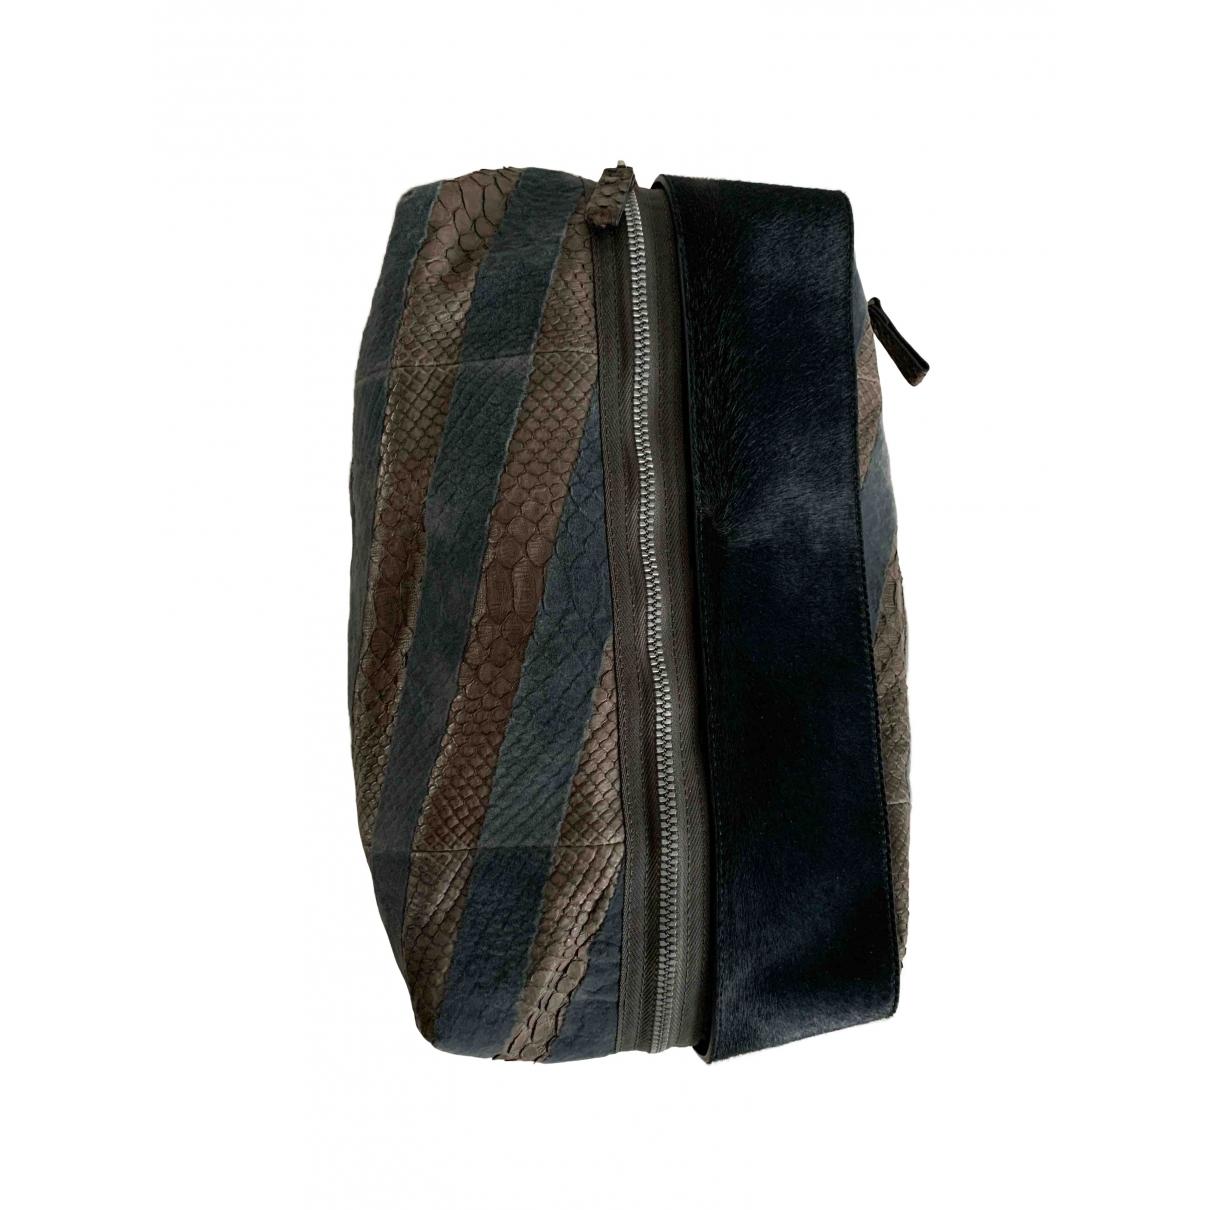 Lanvin \N Green Python Clutch bag for Women \N